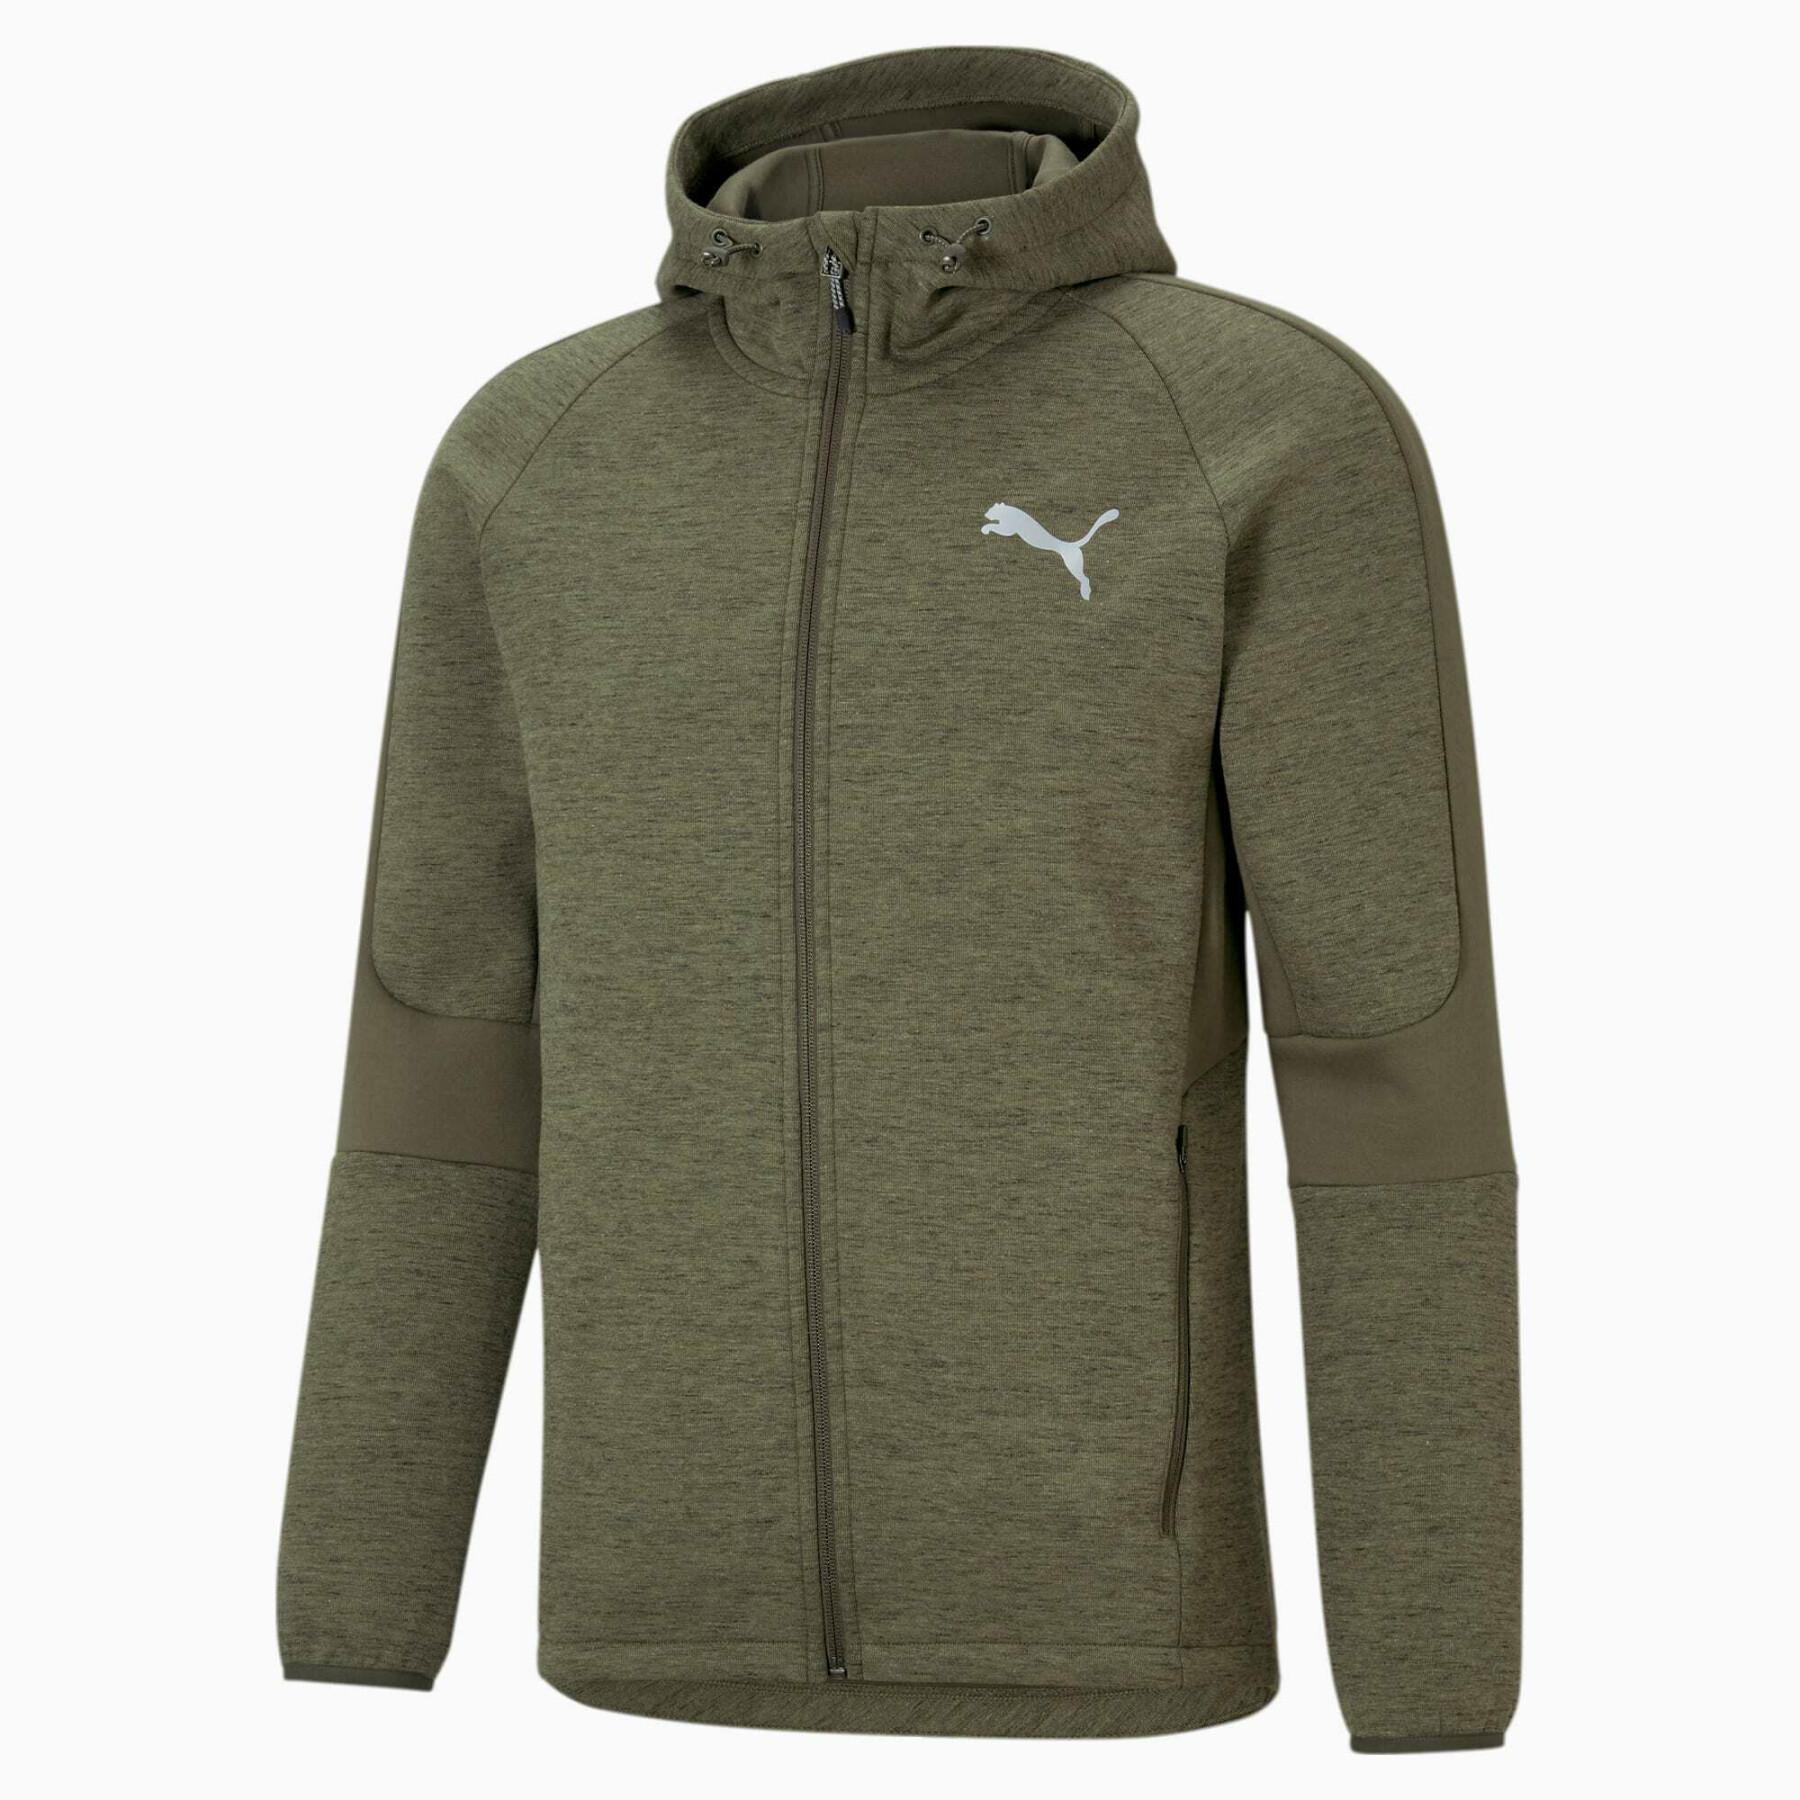 Full-zip sweatshirt Puma Evostripe